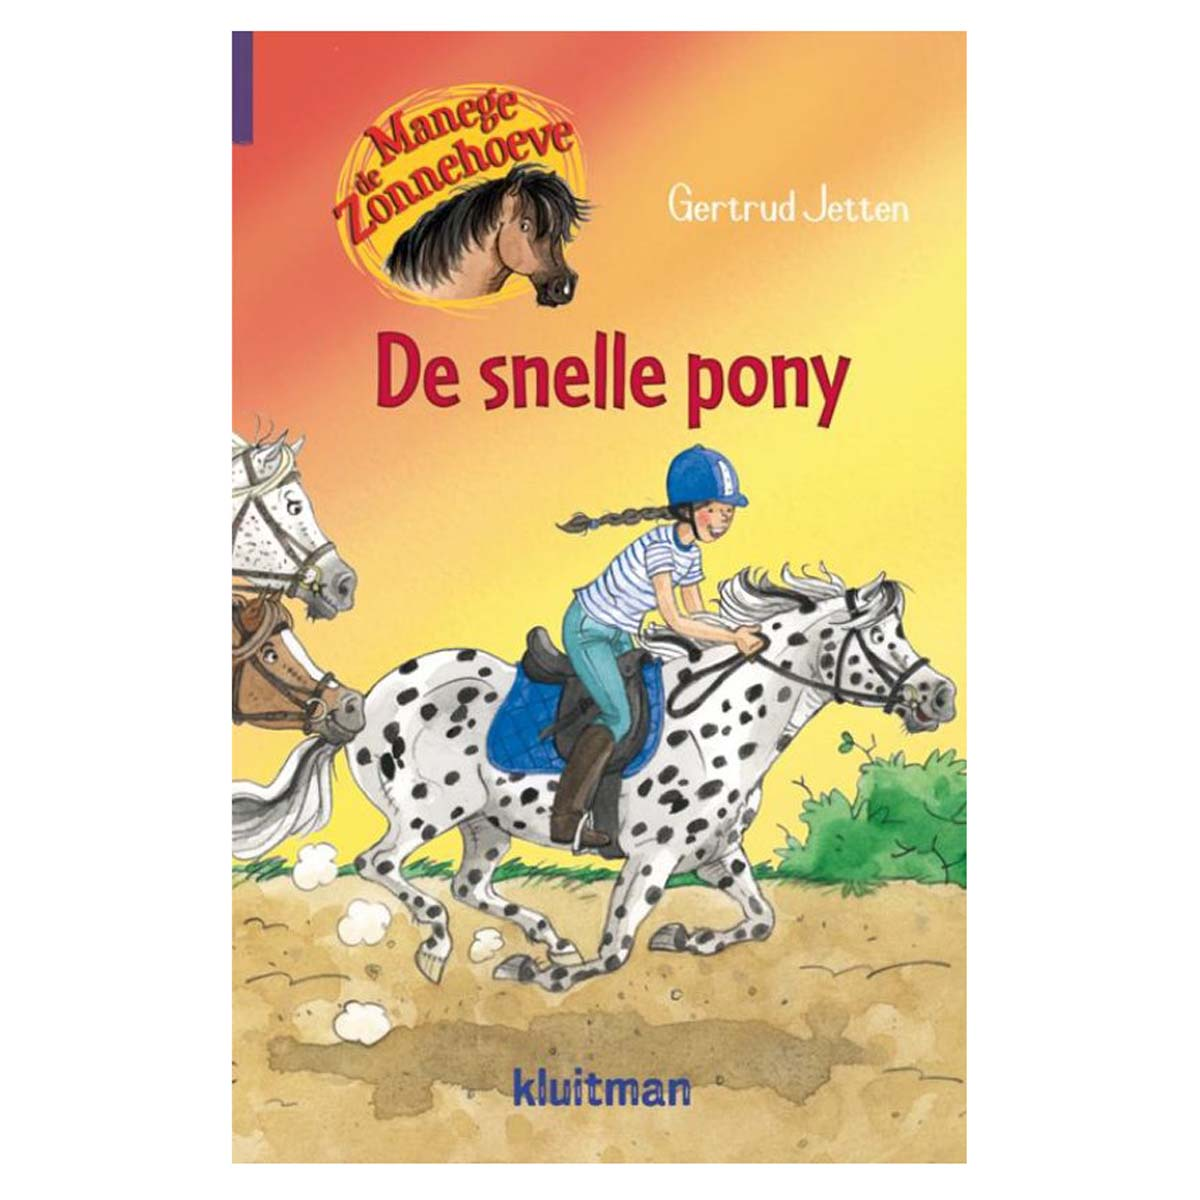 Manege de Zonnehoeve, de snelle pony